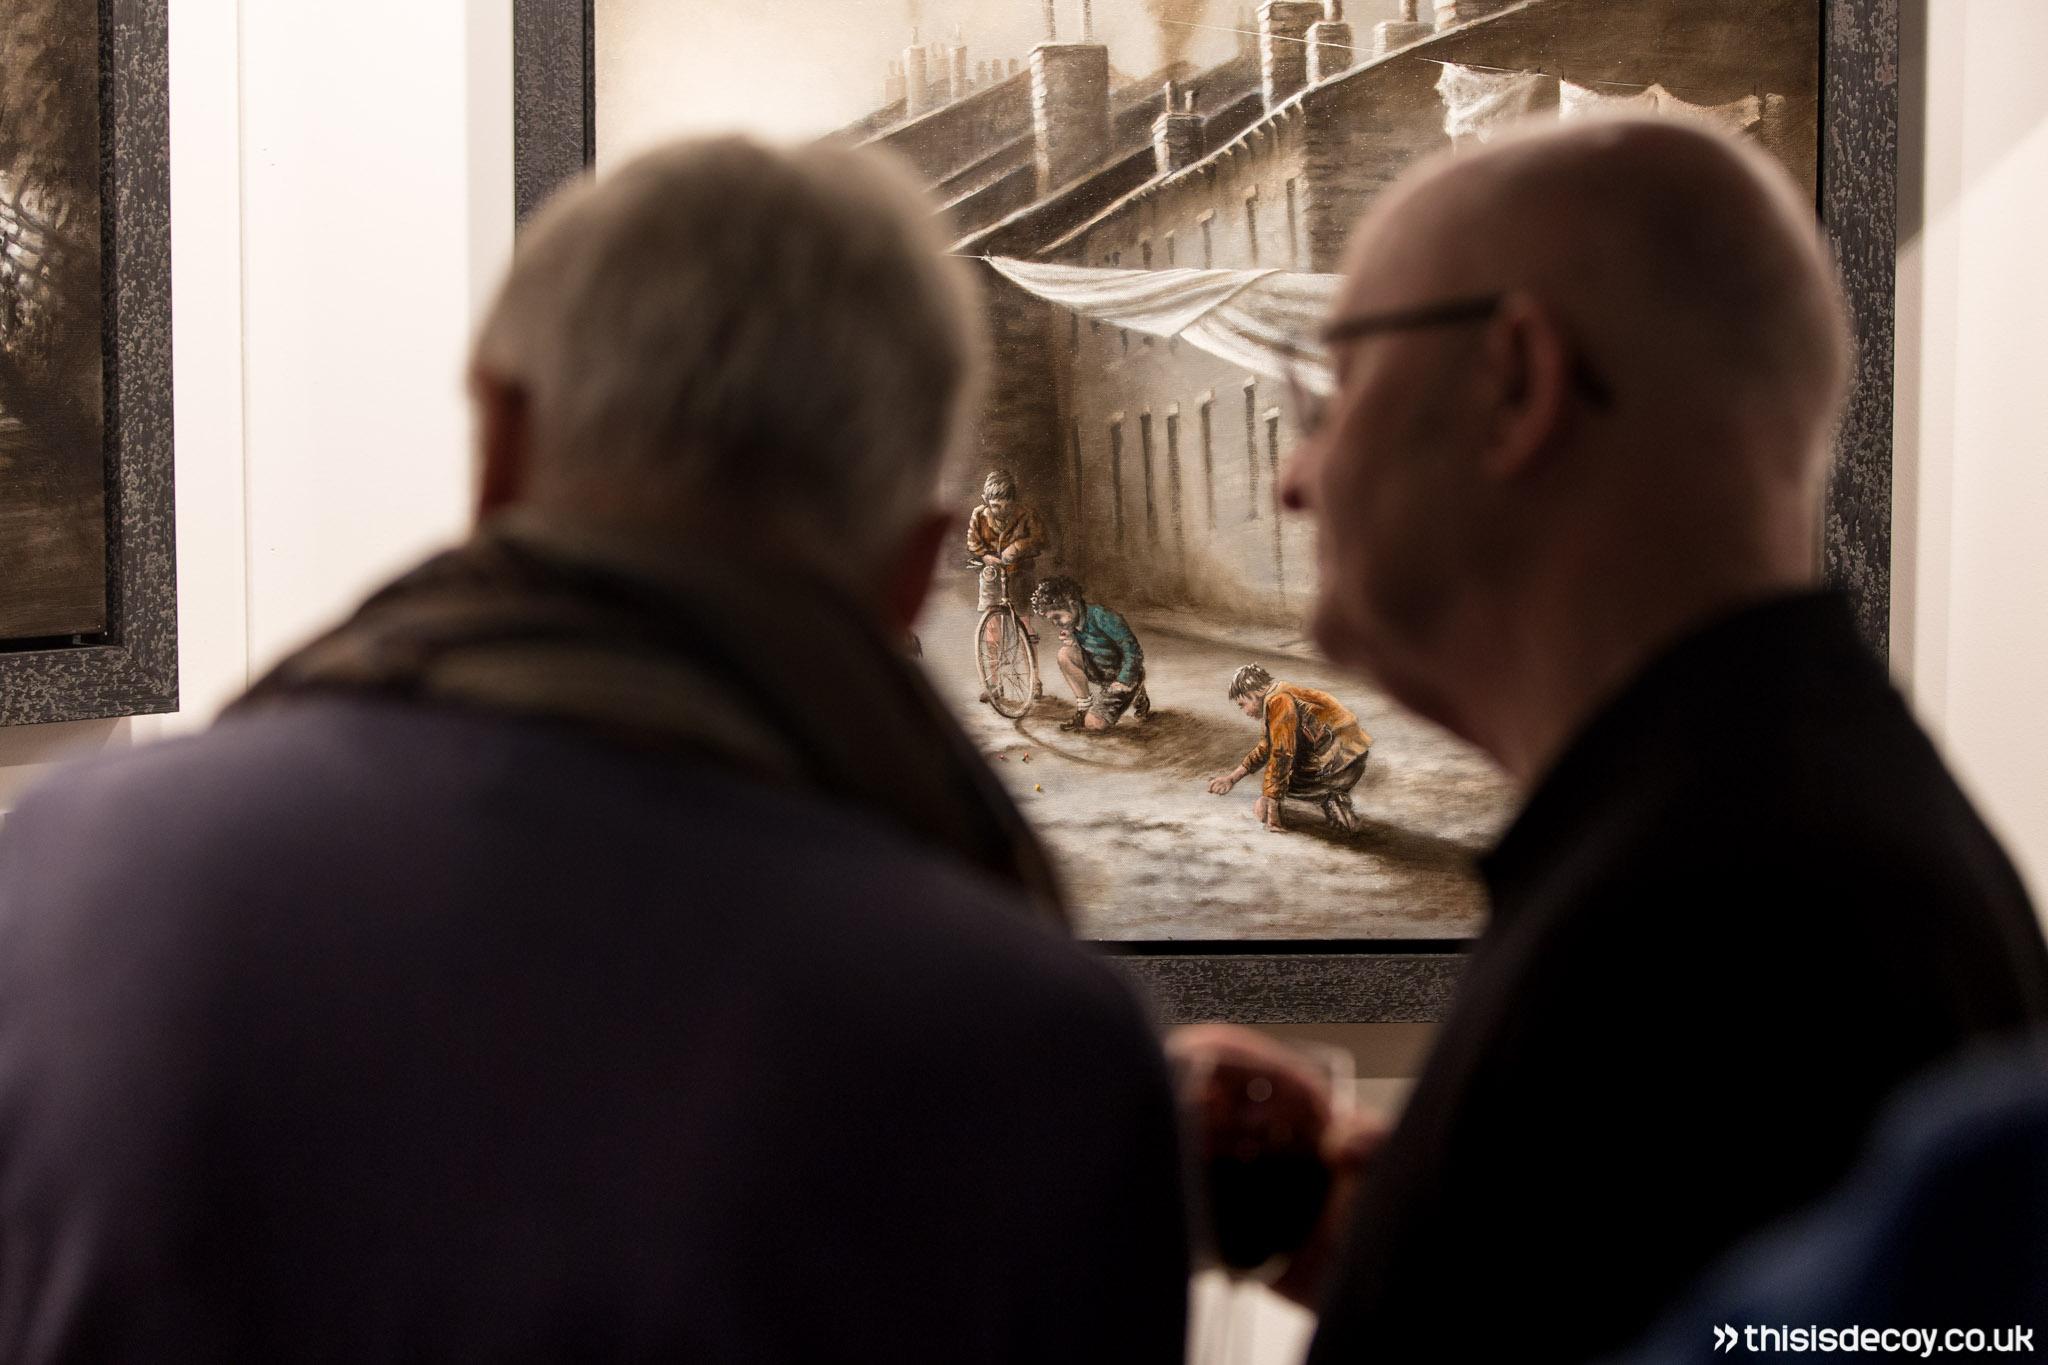 Northern Light - Bob Barker - Leeds City Museum - 20 Jan 17 - Decoy Media - 11.jpg